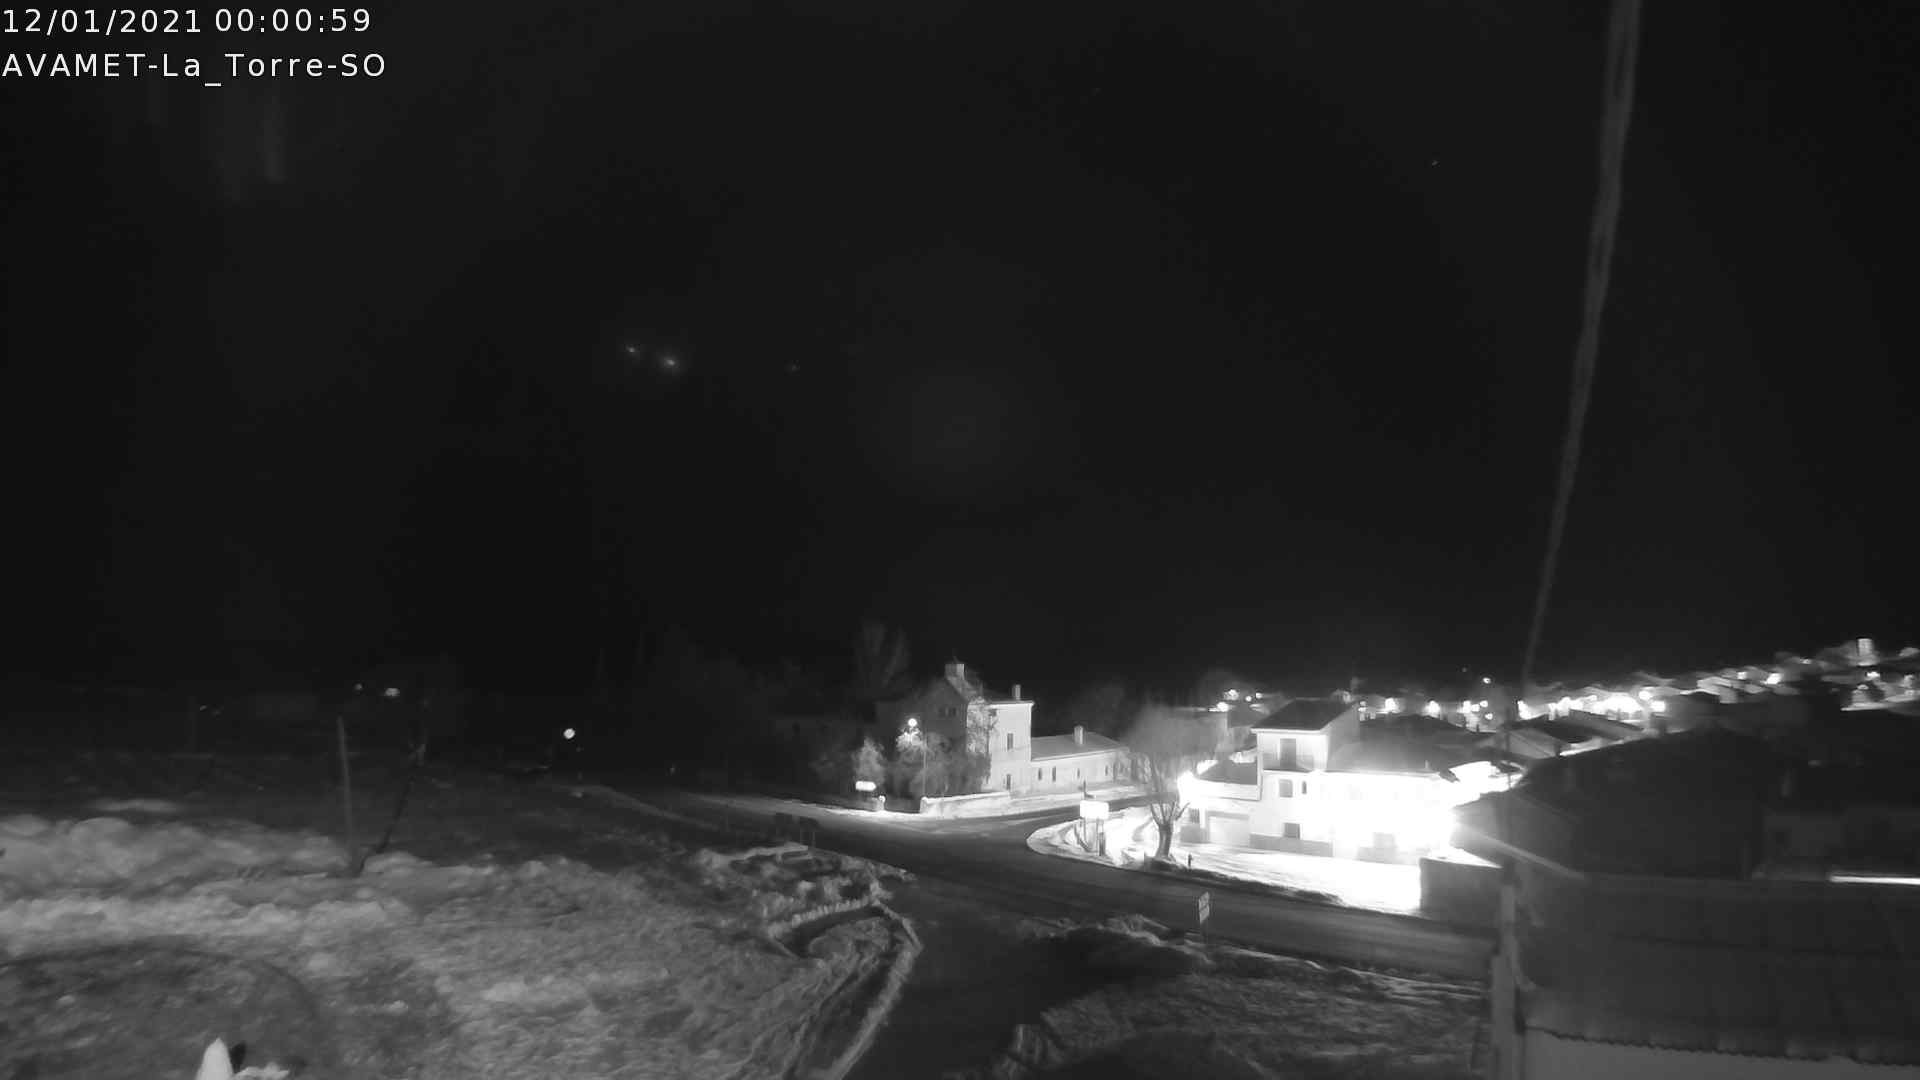 time-lapse frame, 20201112B webcam